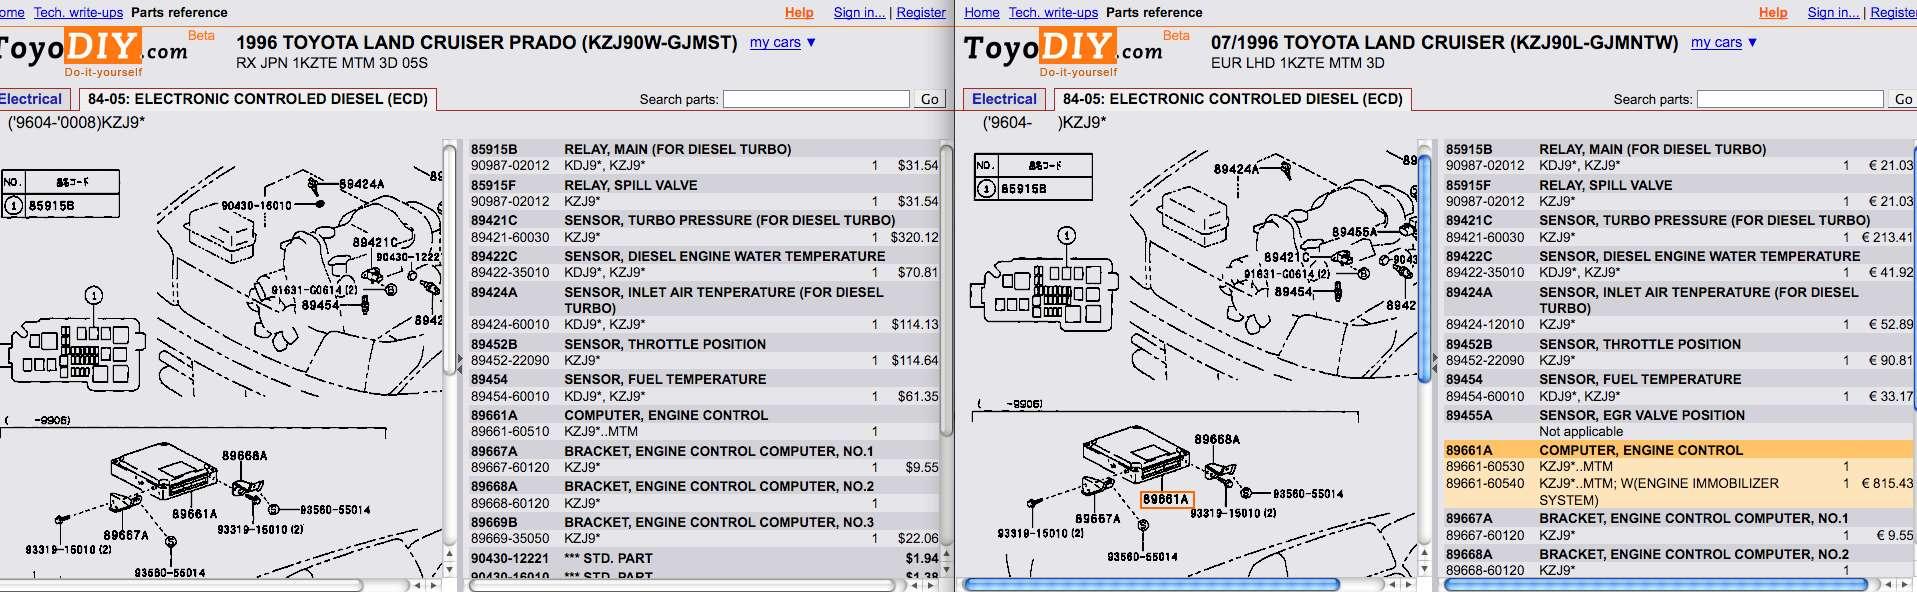 Wiring Diagram Toyota 1kz Te Hiace Exelent Component Ideas